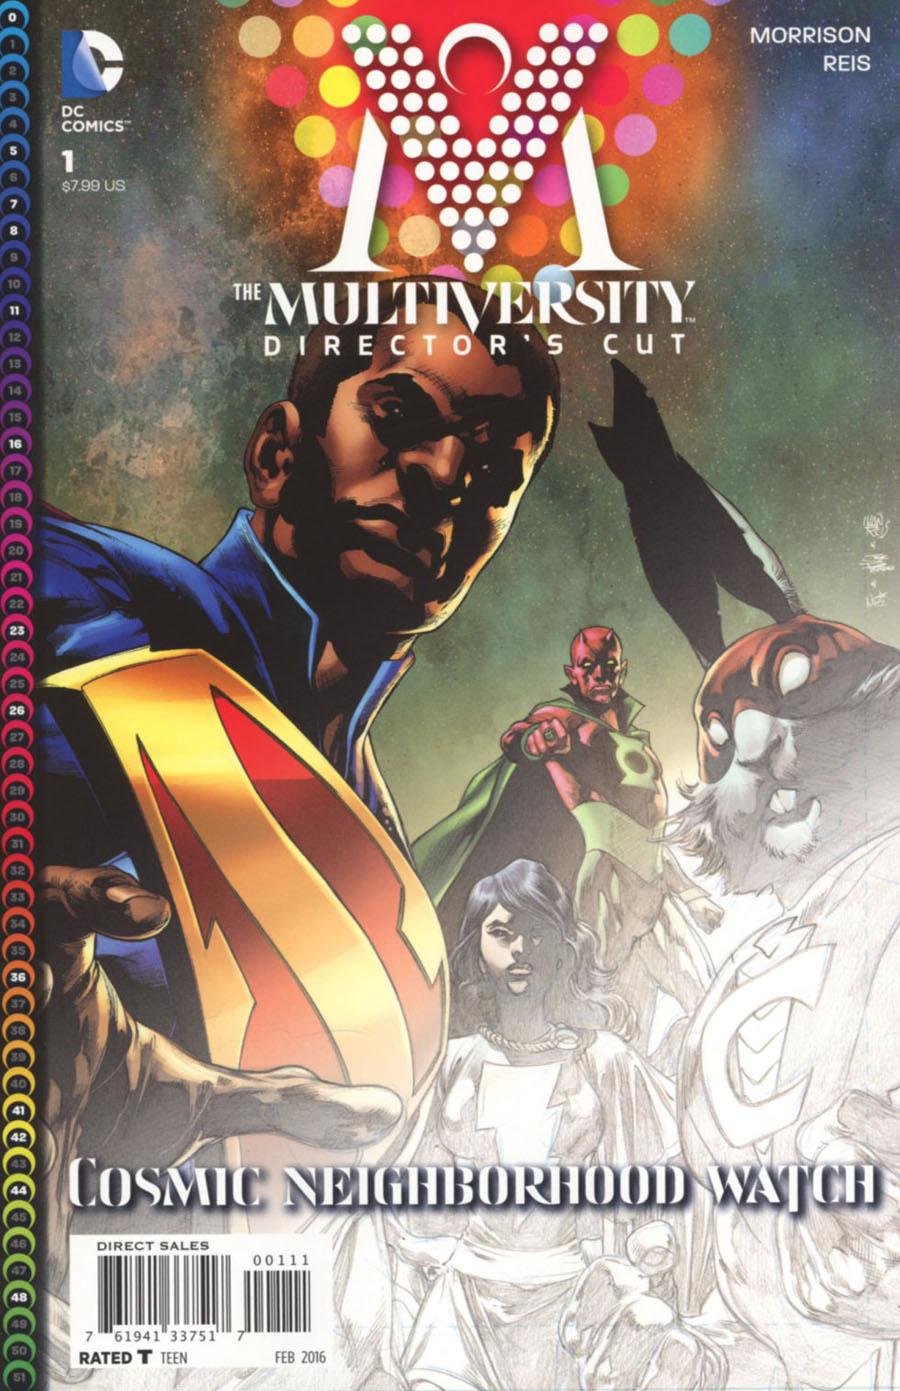 Multiversity #1 & #2 Directors Cut